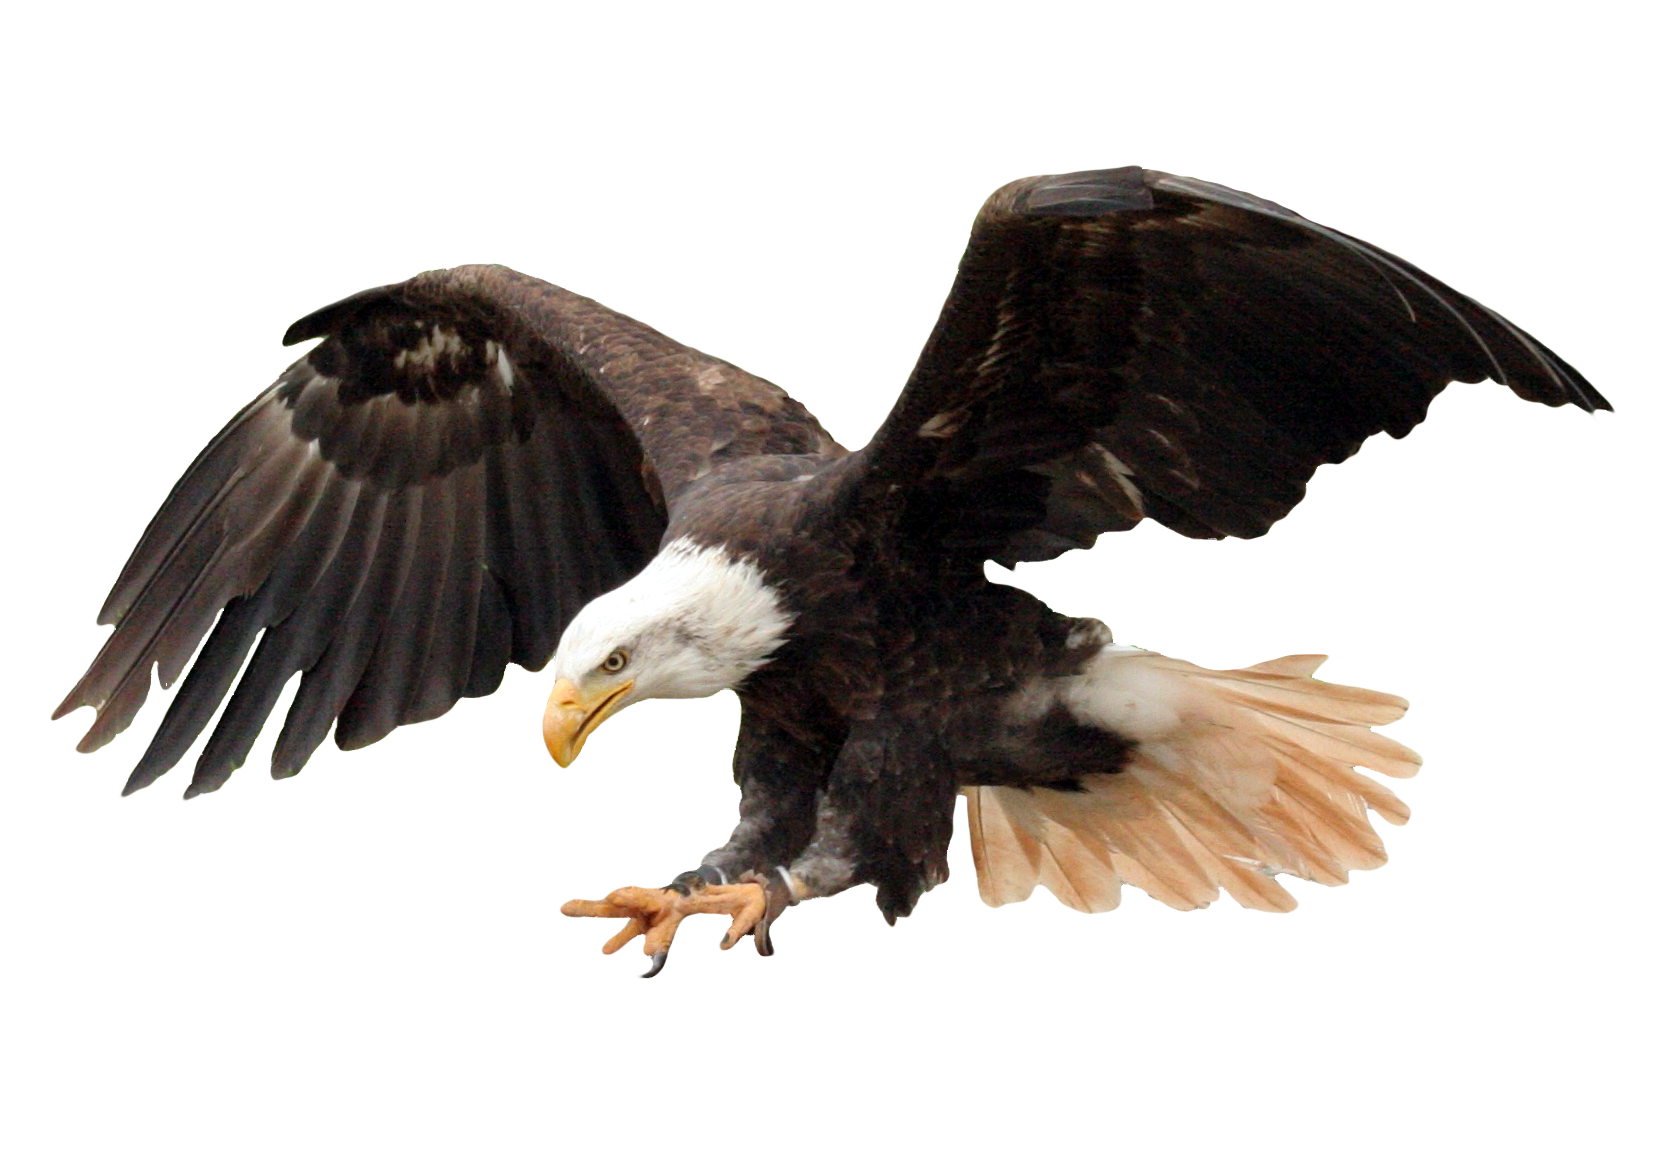 bald eagle png image purepng free transparent cc0 png